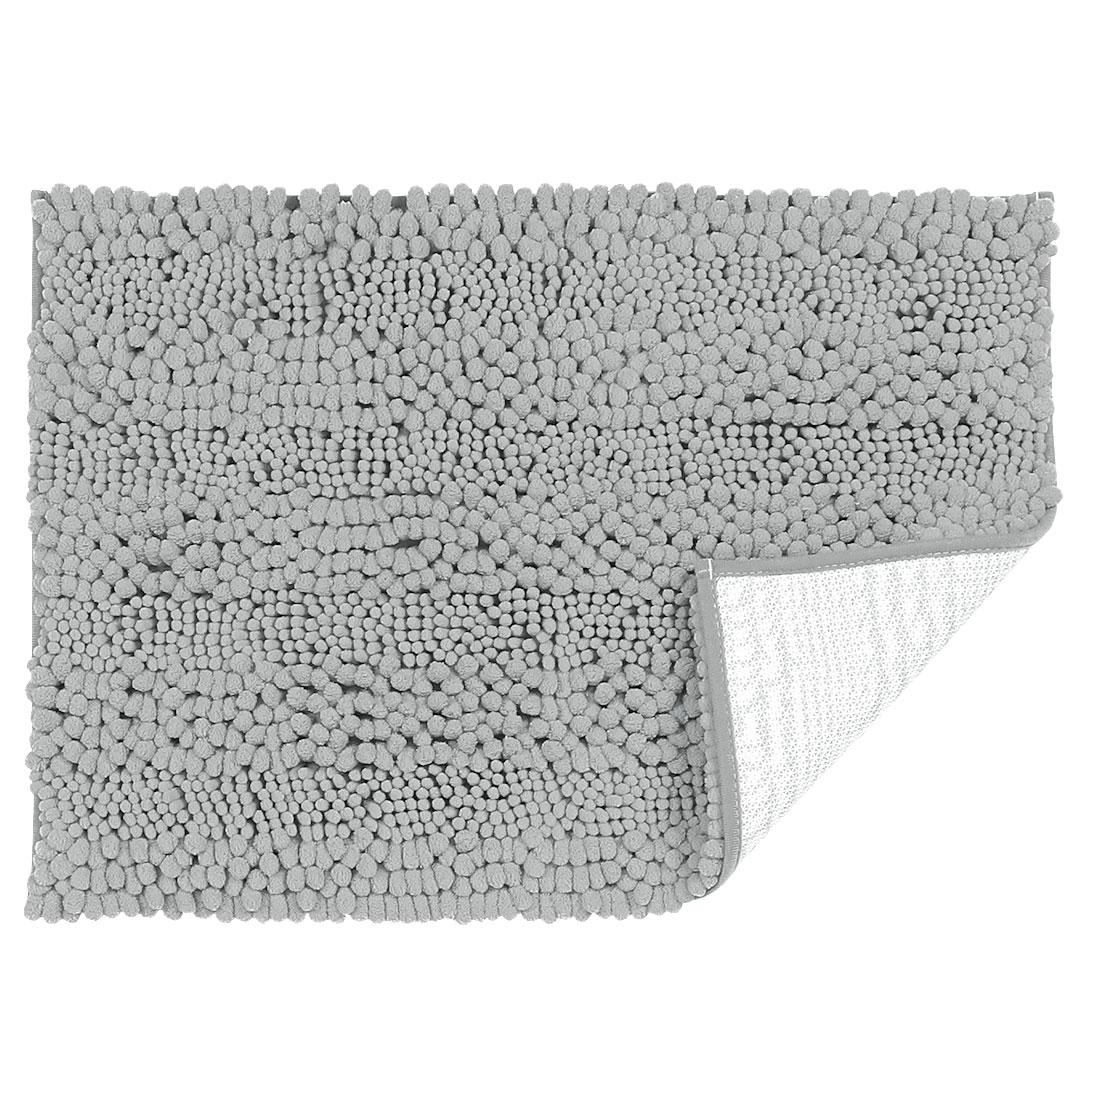 17 x 24 Inch Luxury Soft Plush Shaggy Bath Mat Chenille Rug Carpet Light Gray